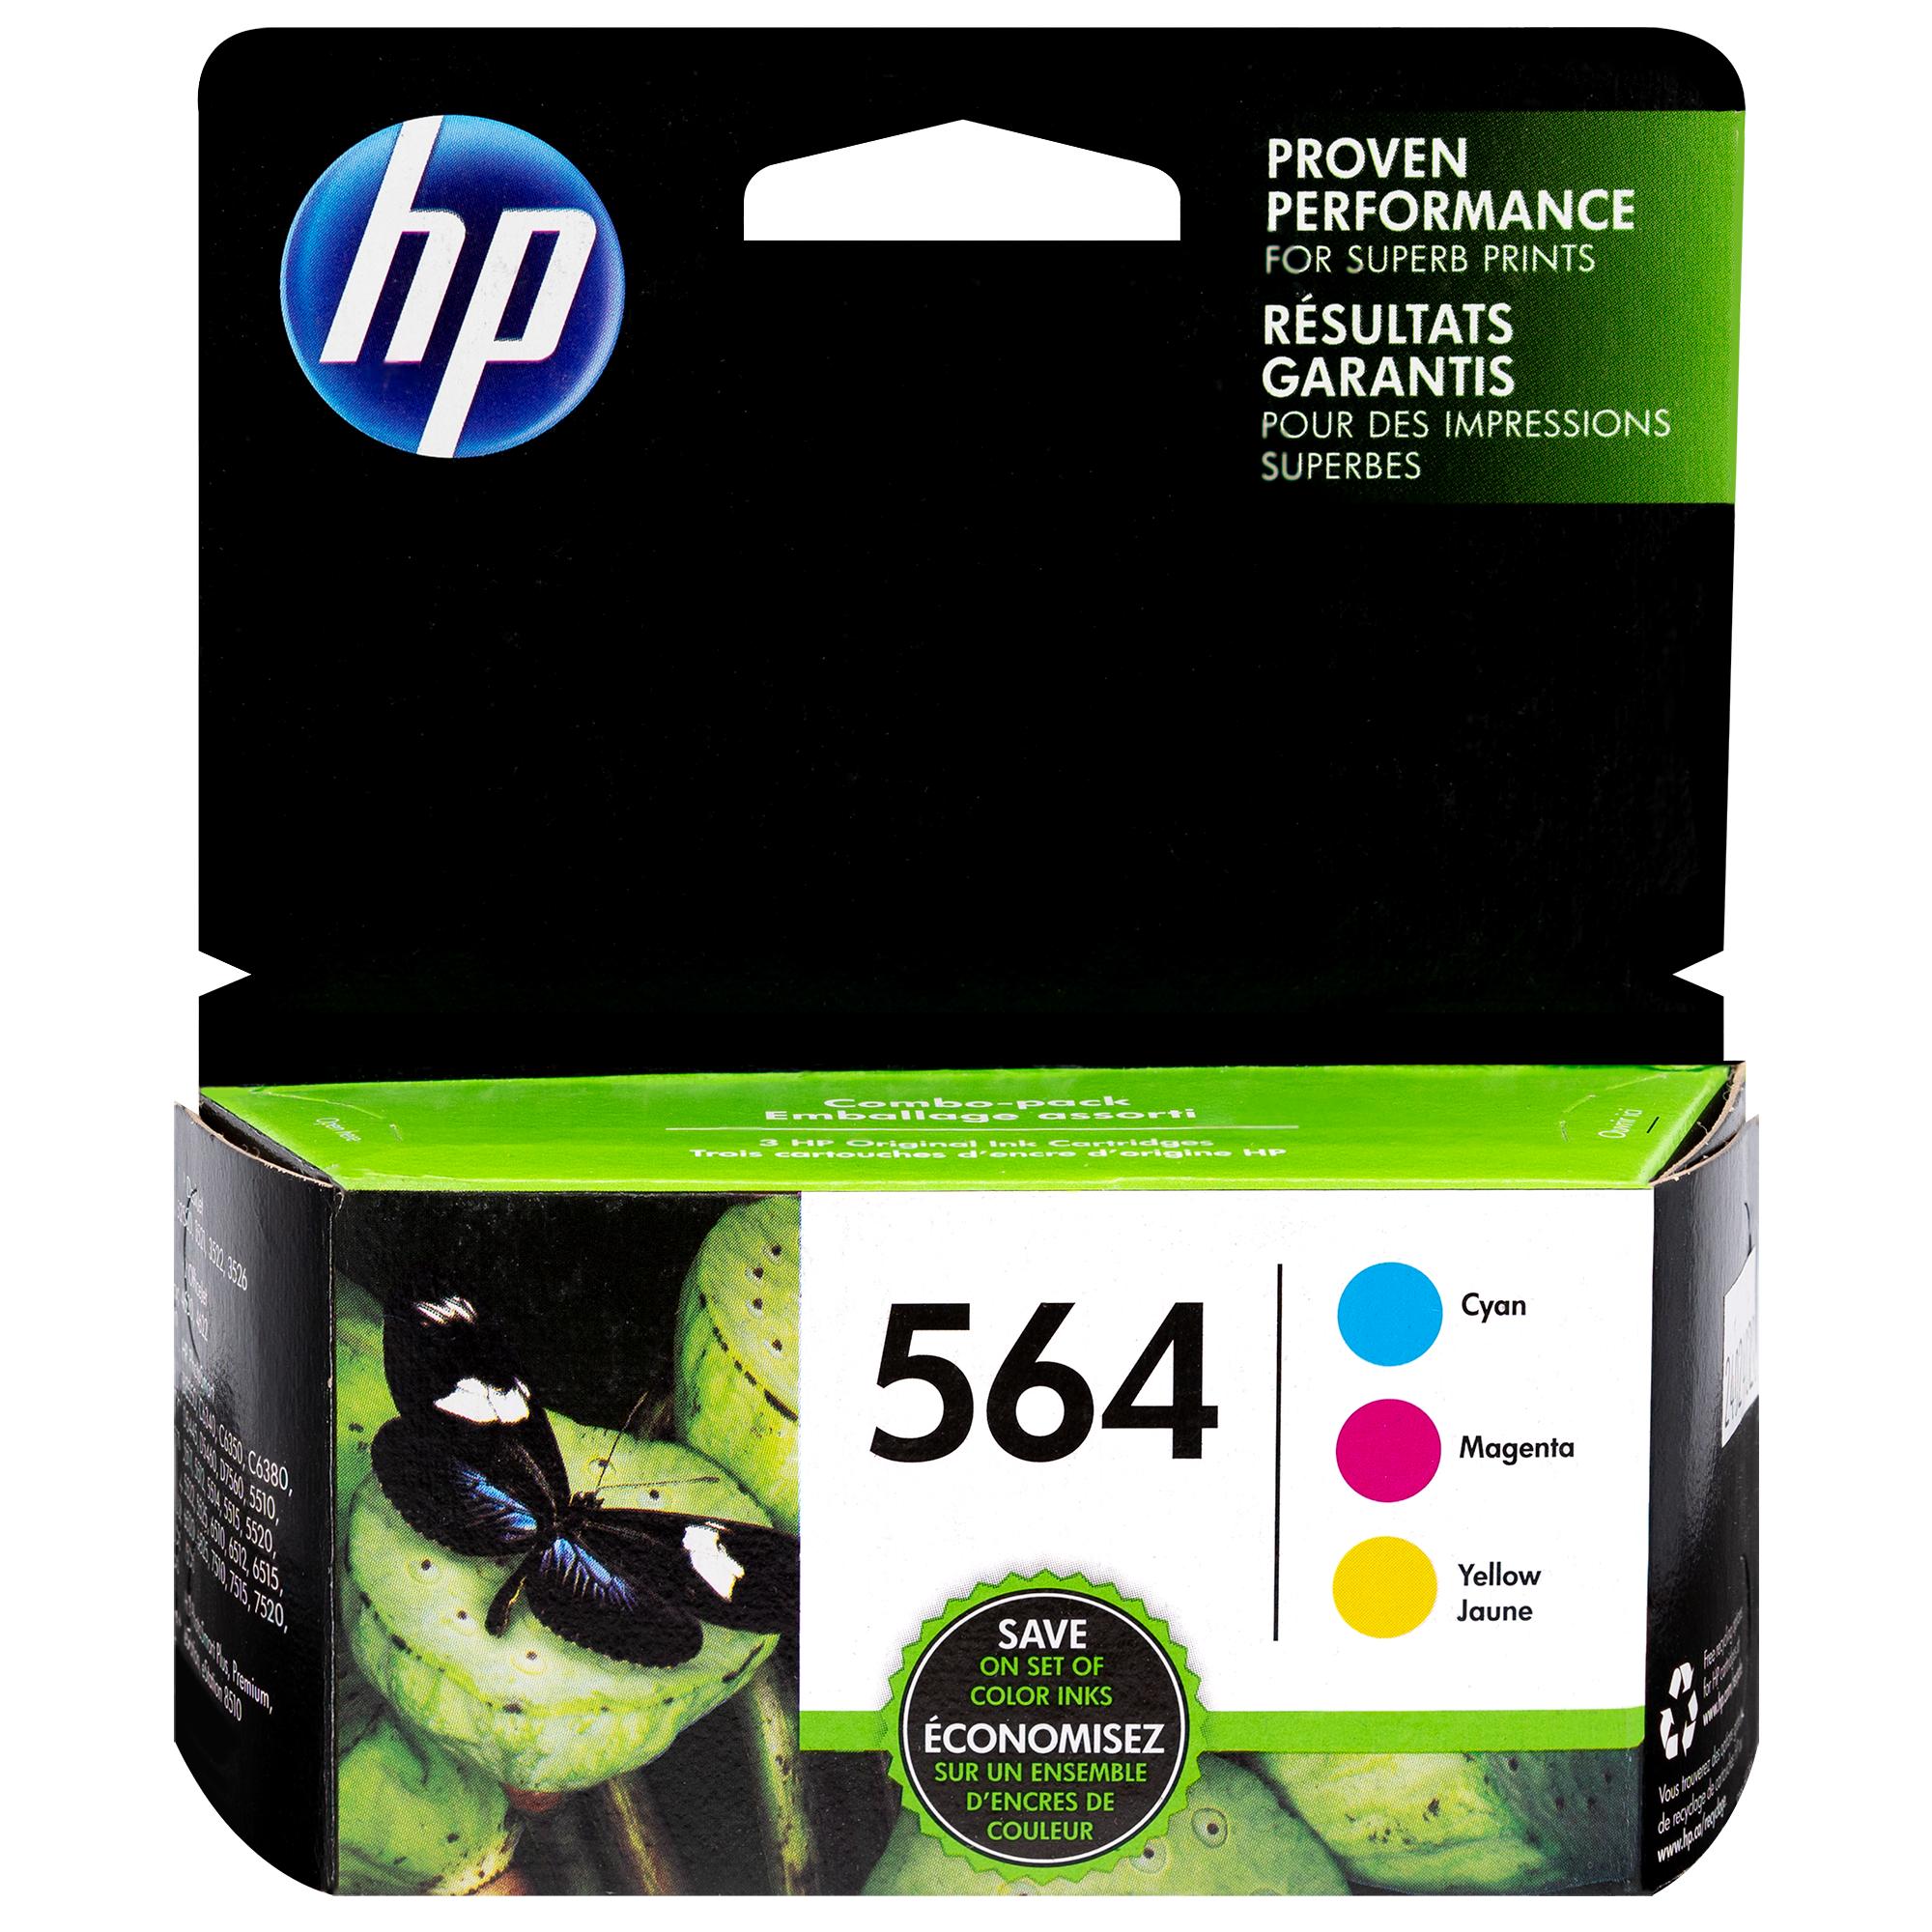 N9H57FN | HP 564 | Original HP Ink Cartridges - Tri-Color